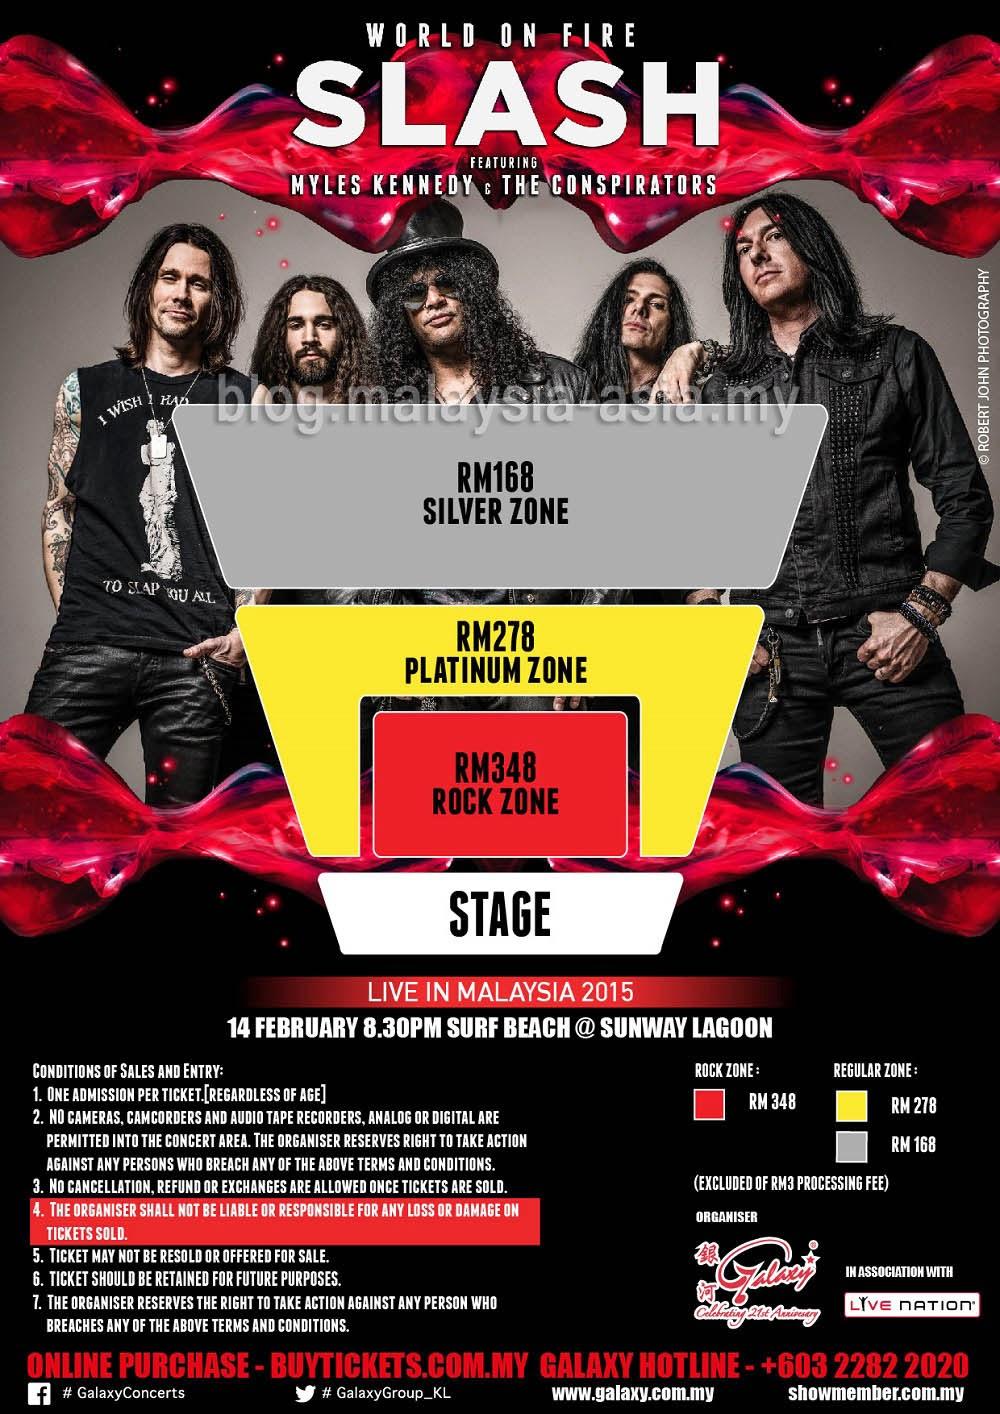 Malaysia Slash Concert